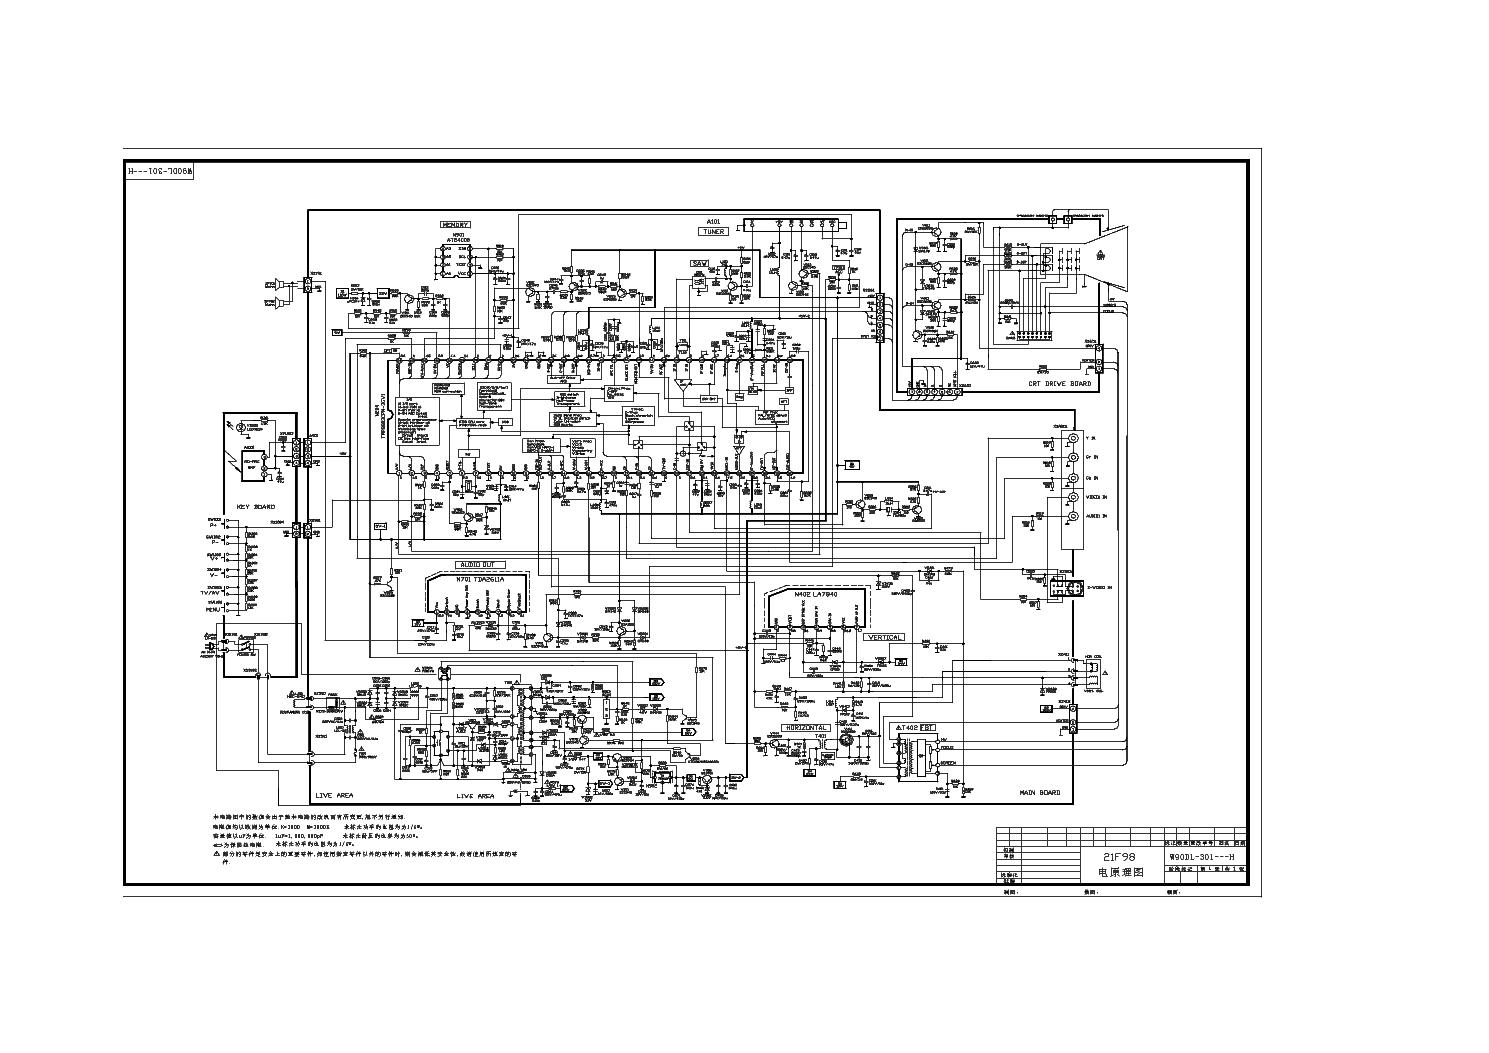 Haier Tv Schematic Wiring Diagram Strategy Design Plan Lg Ph Meter Circuit Radio Led Ht 2199 Service Manual Download Schematics Eeprom Repair Rh Elektrotanya Com 32 Remote